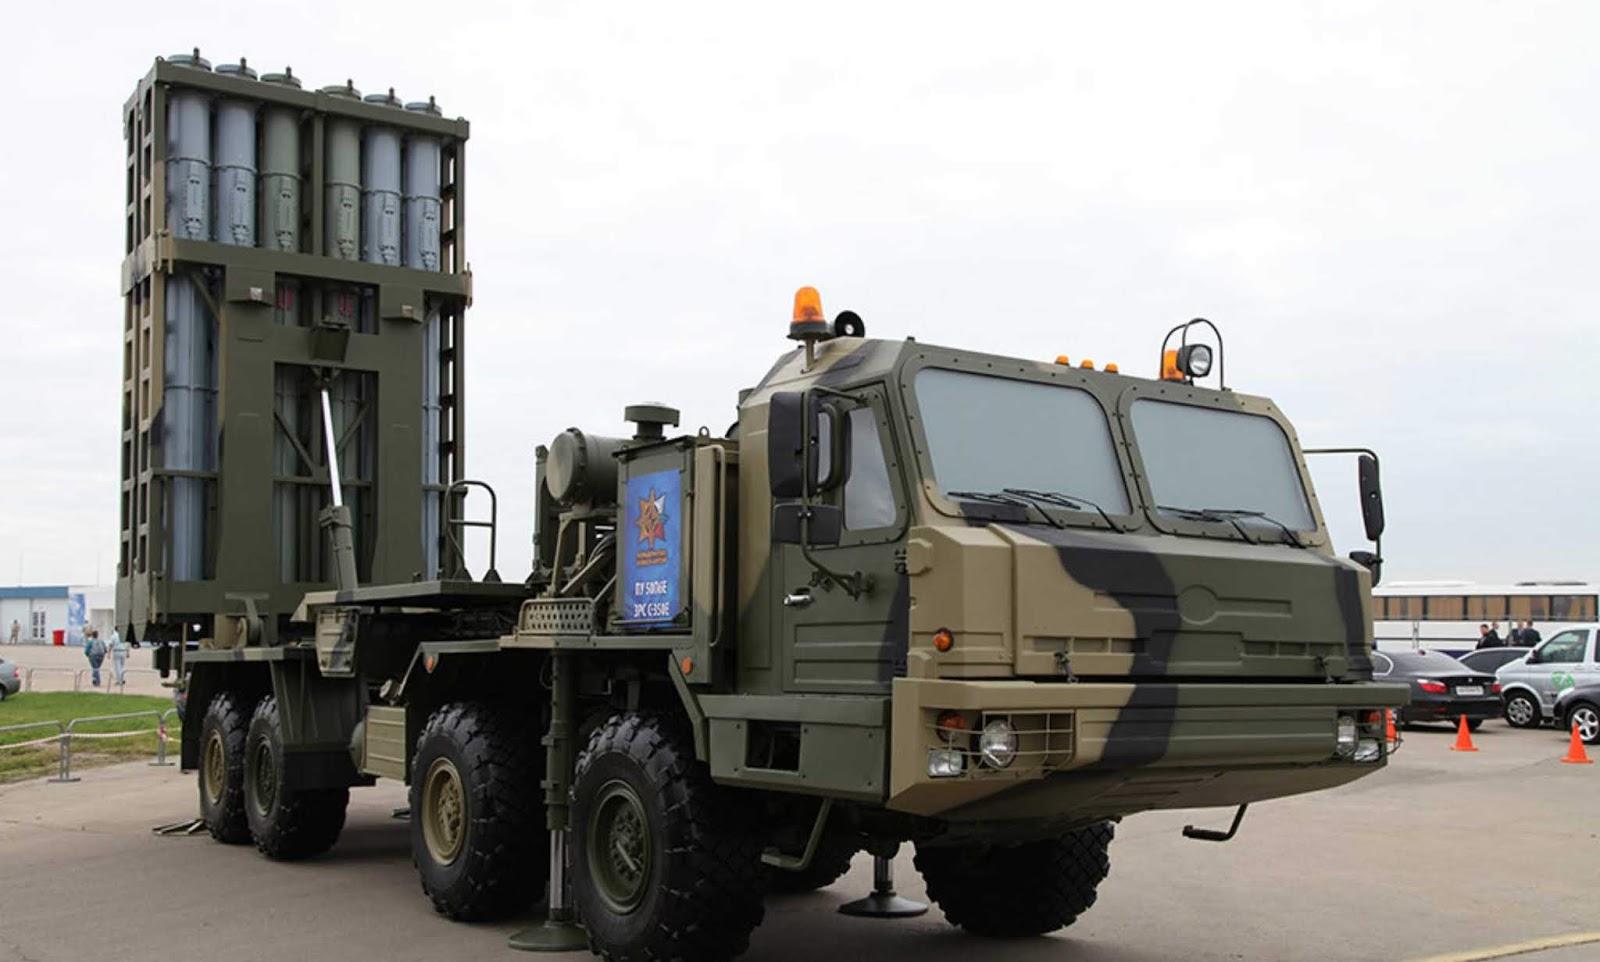 Tahap akhir tes negara dari sistem rudal pertahanan udara Vityaz sedang berlangsung